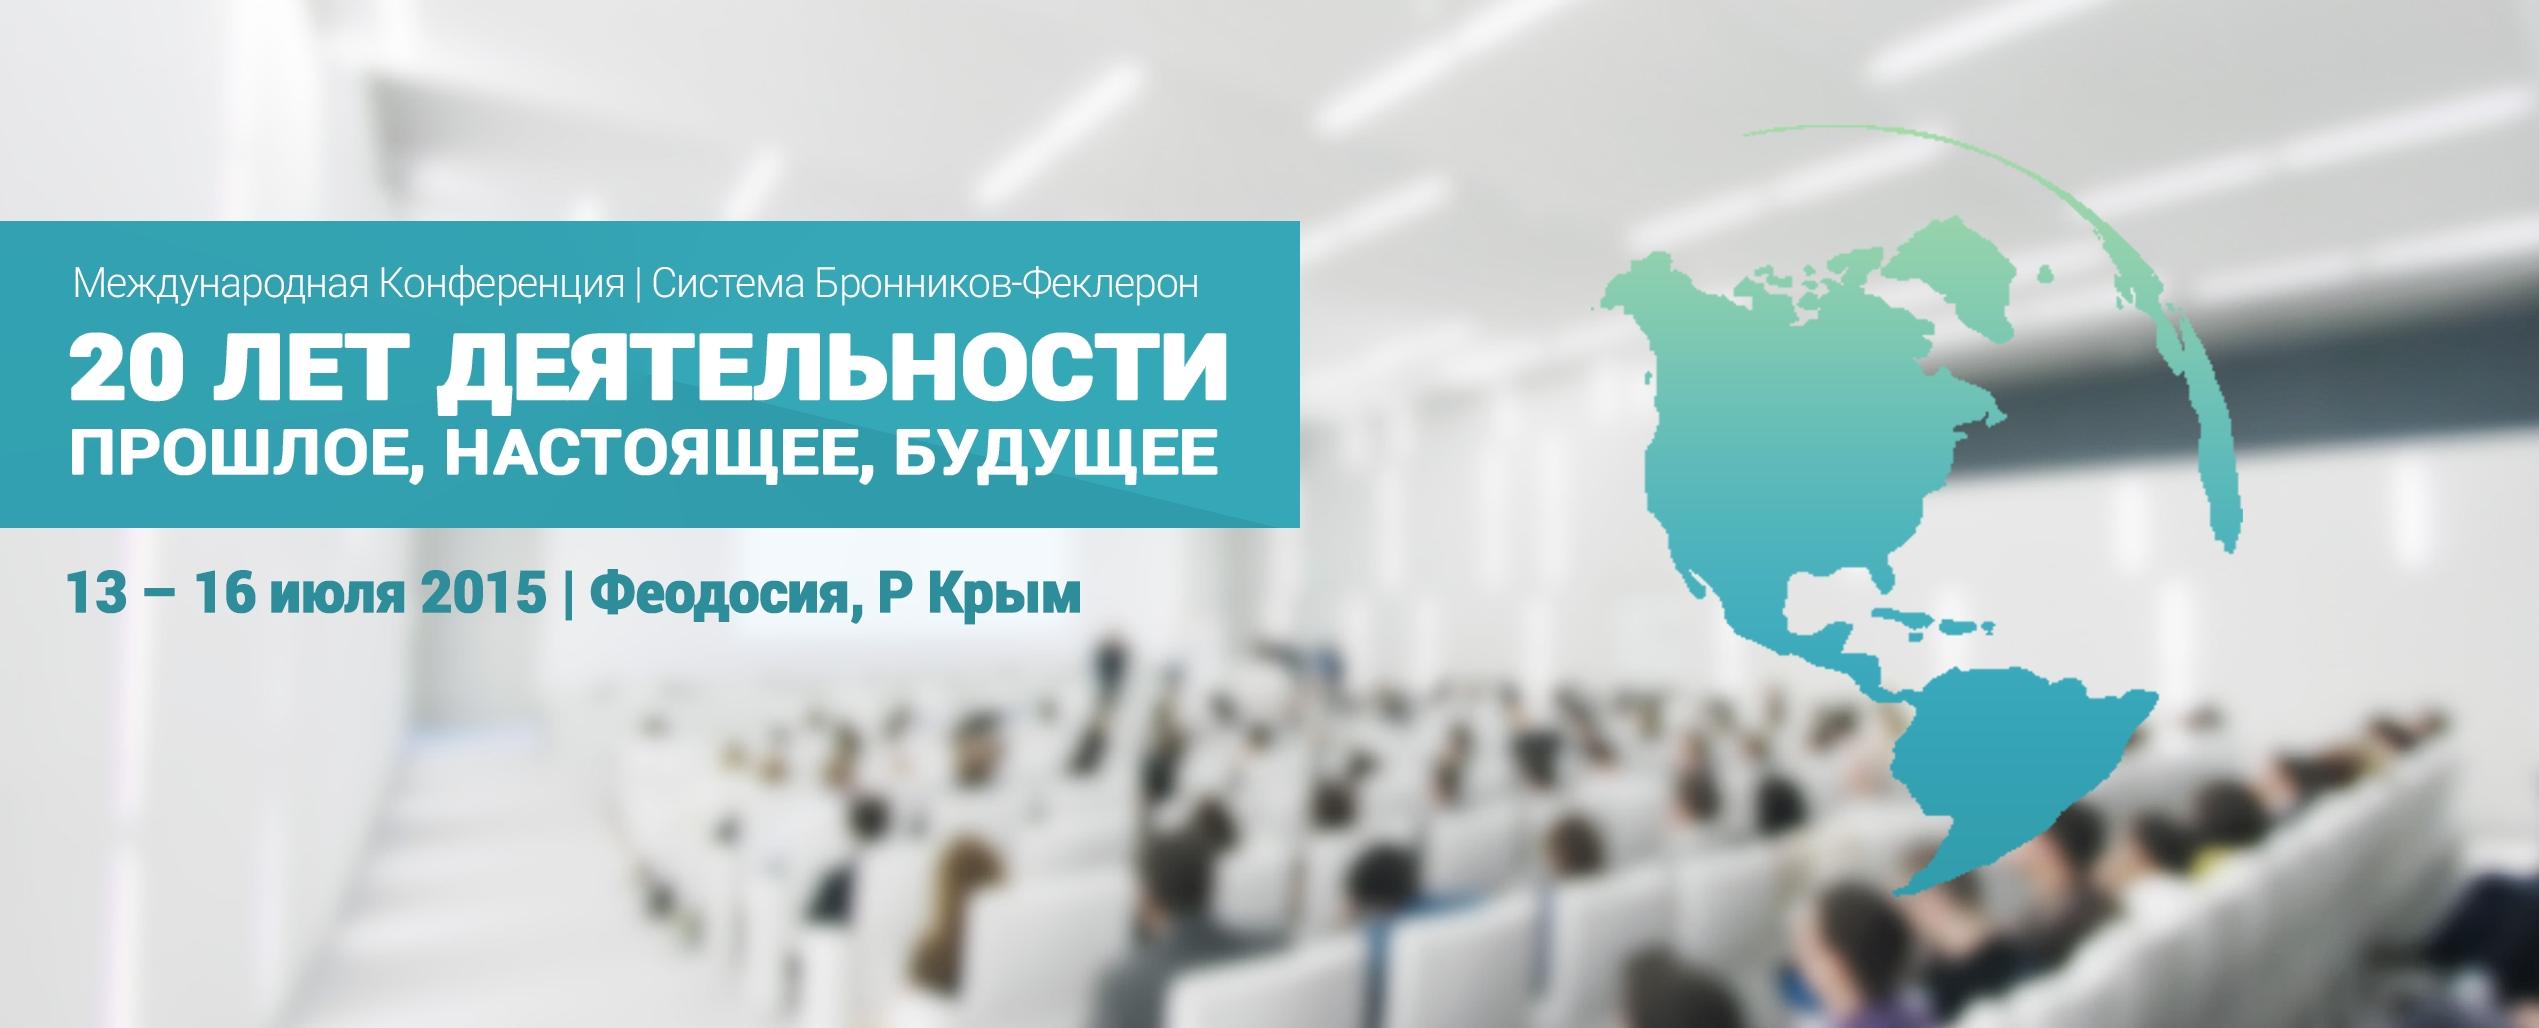 Конференция в Феодосии 2015